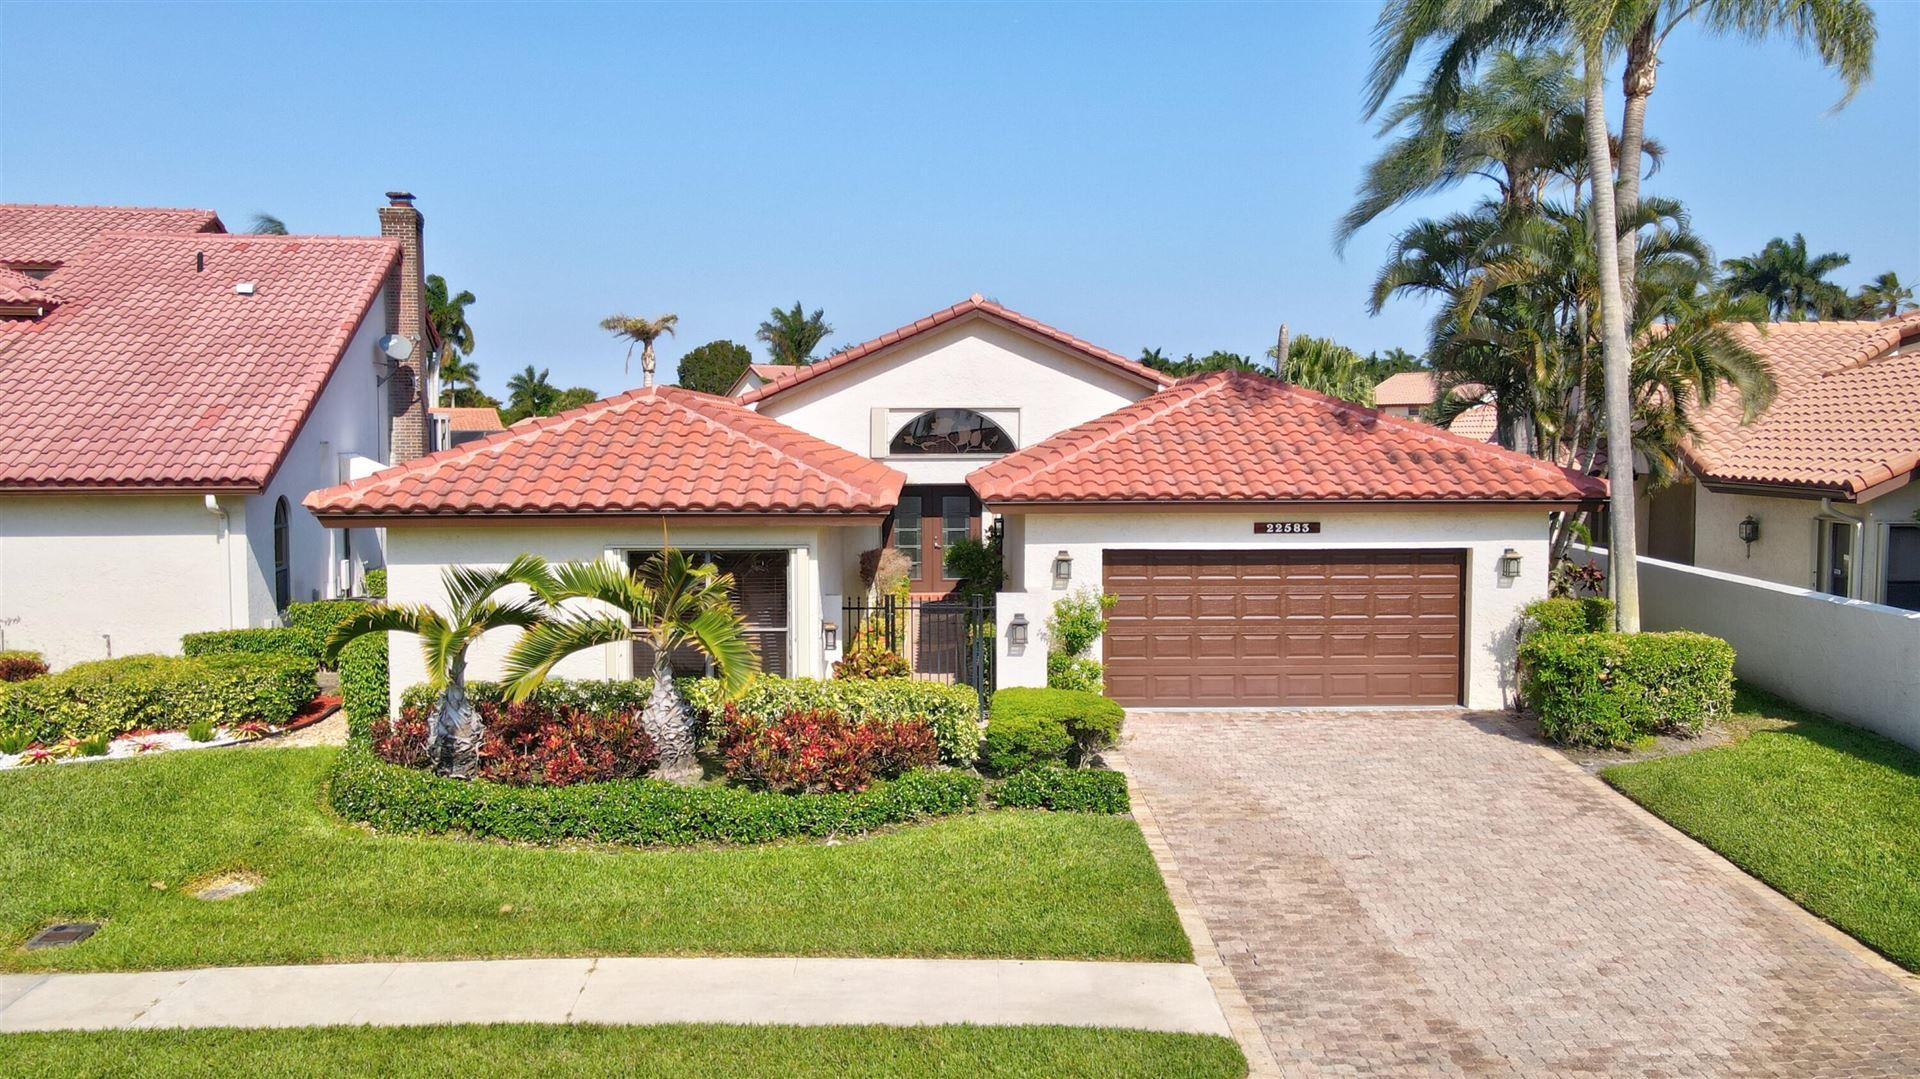 22583 Esplanada Circle W, Boca Raton, FL 33433 - #: RX-10708035